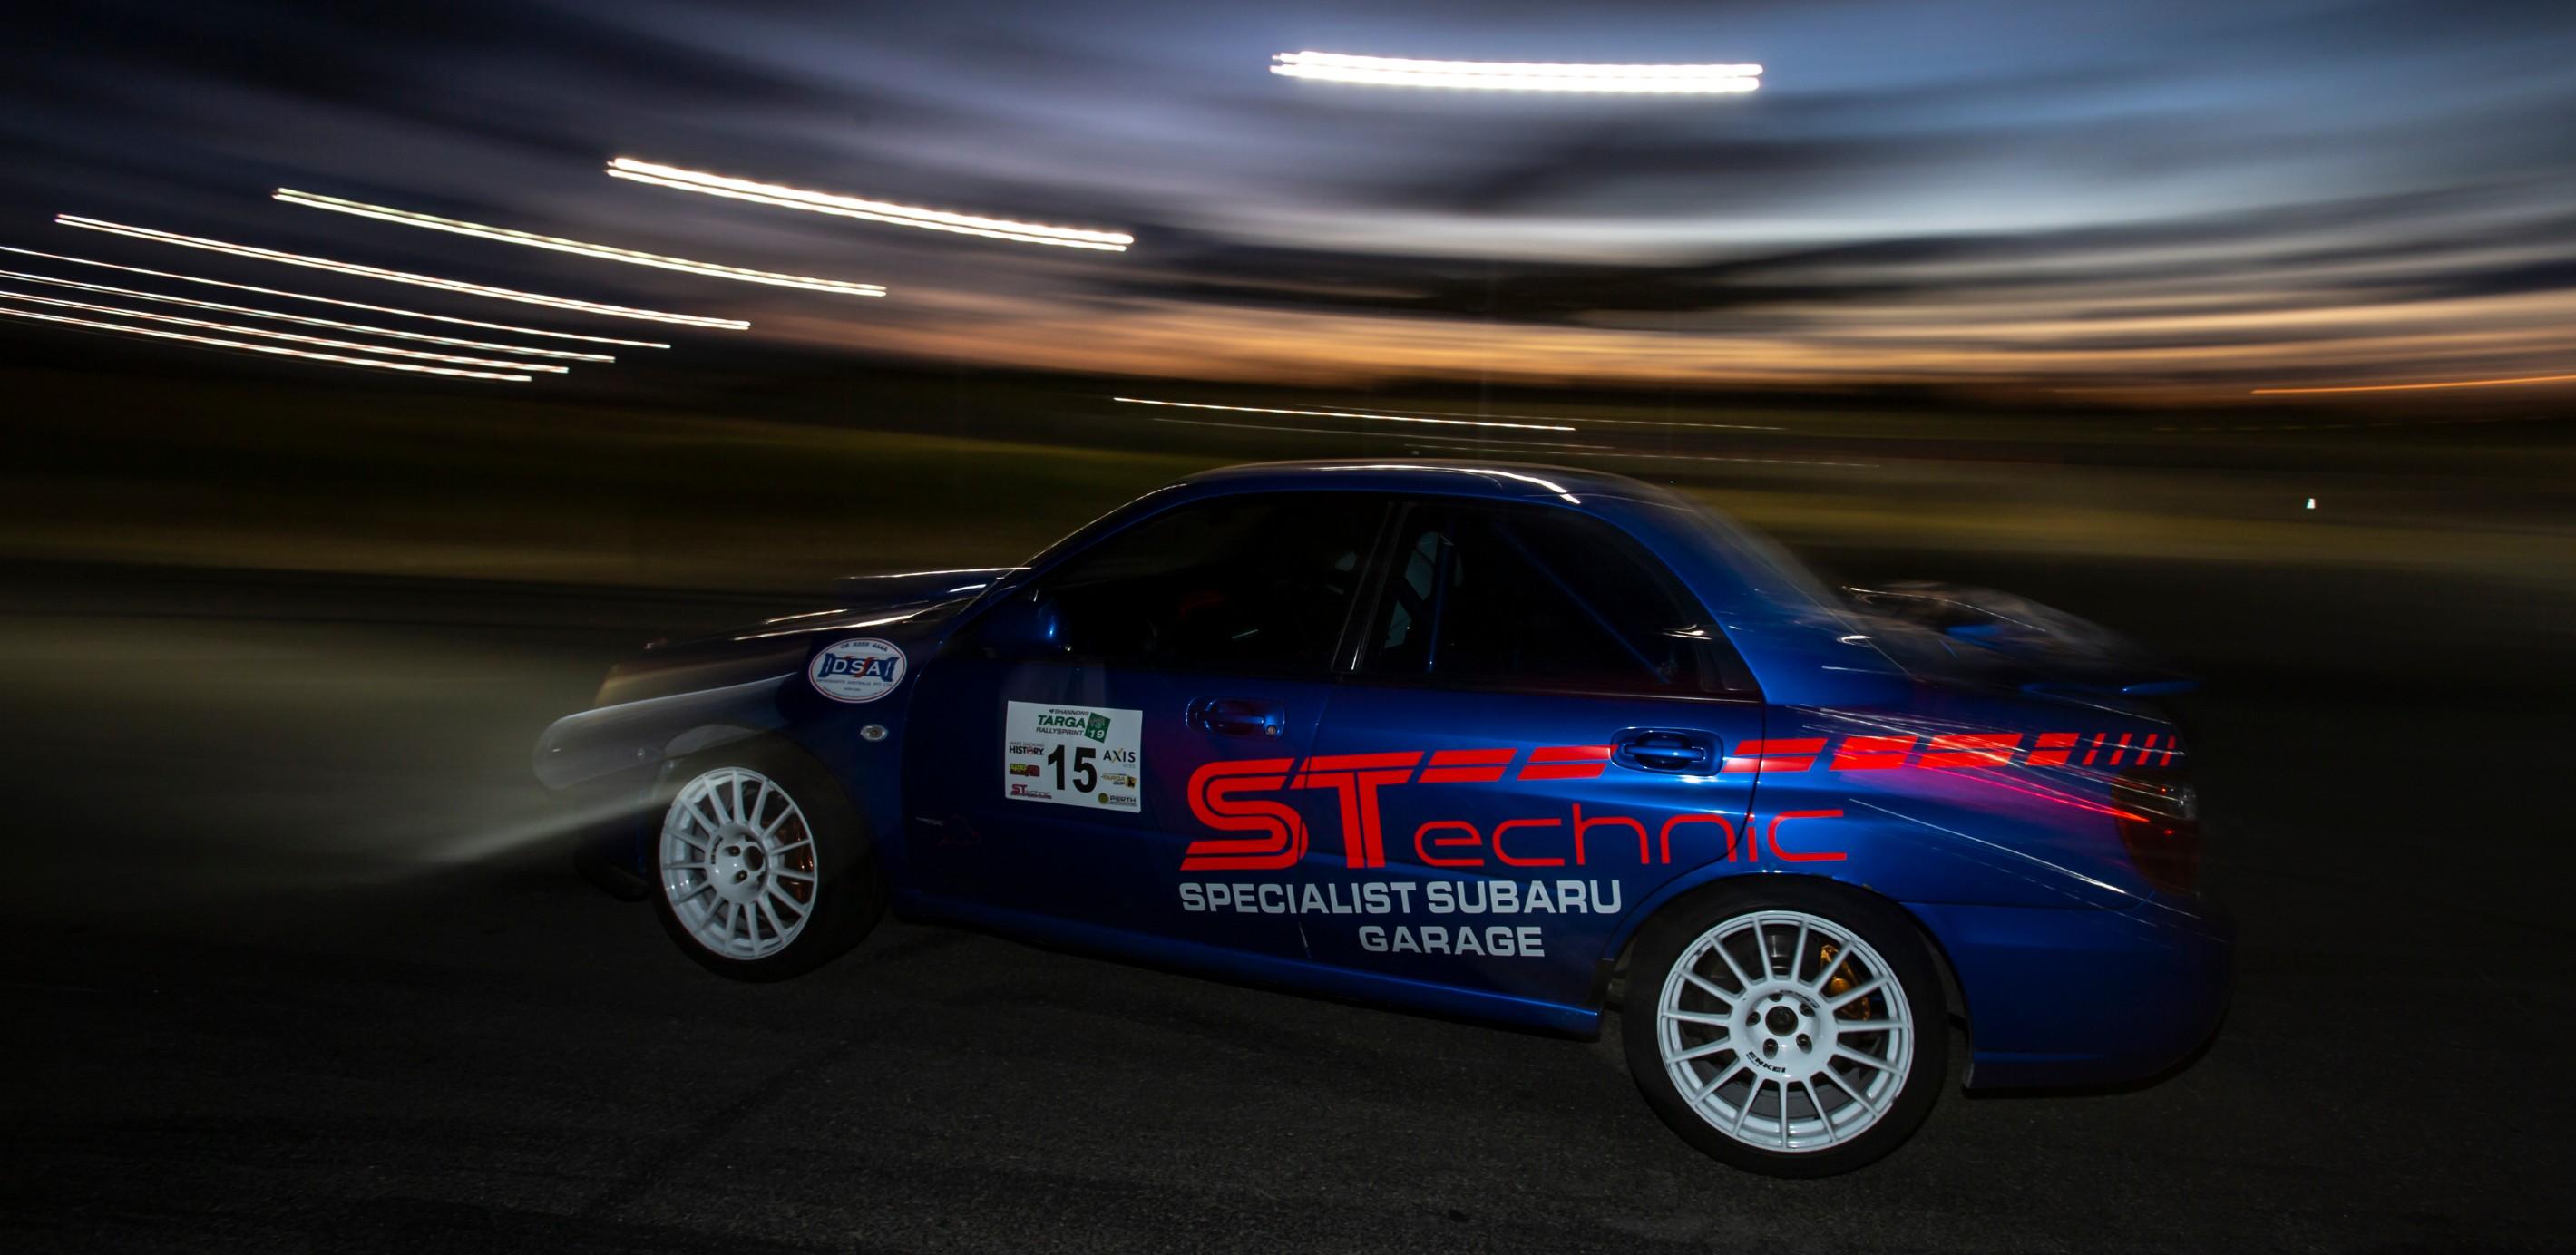 Subaru Specialist Workshop - STechnic